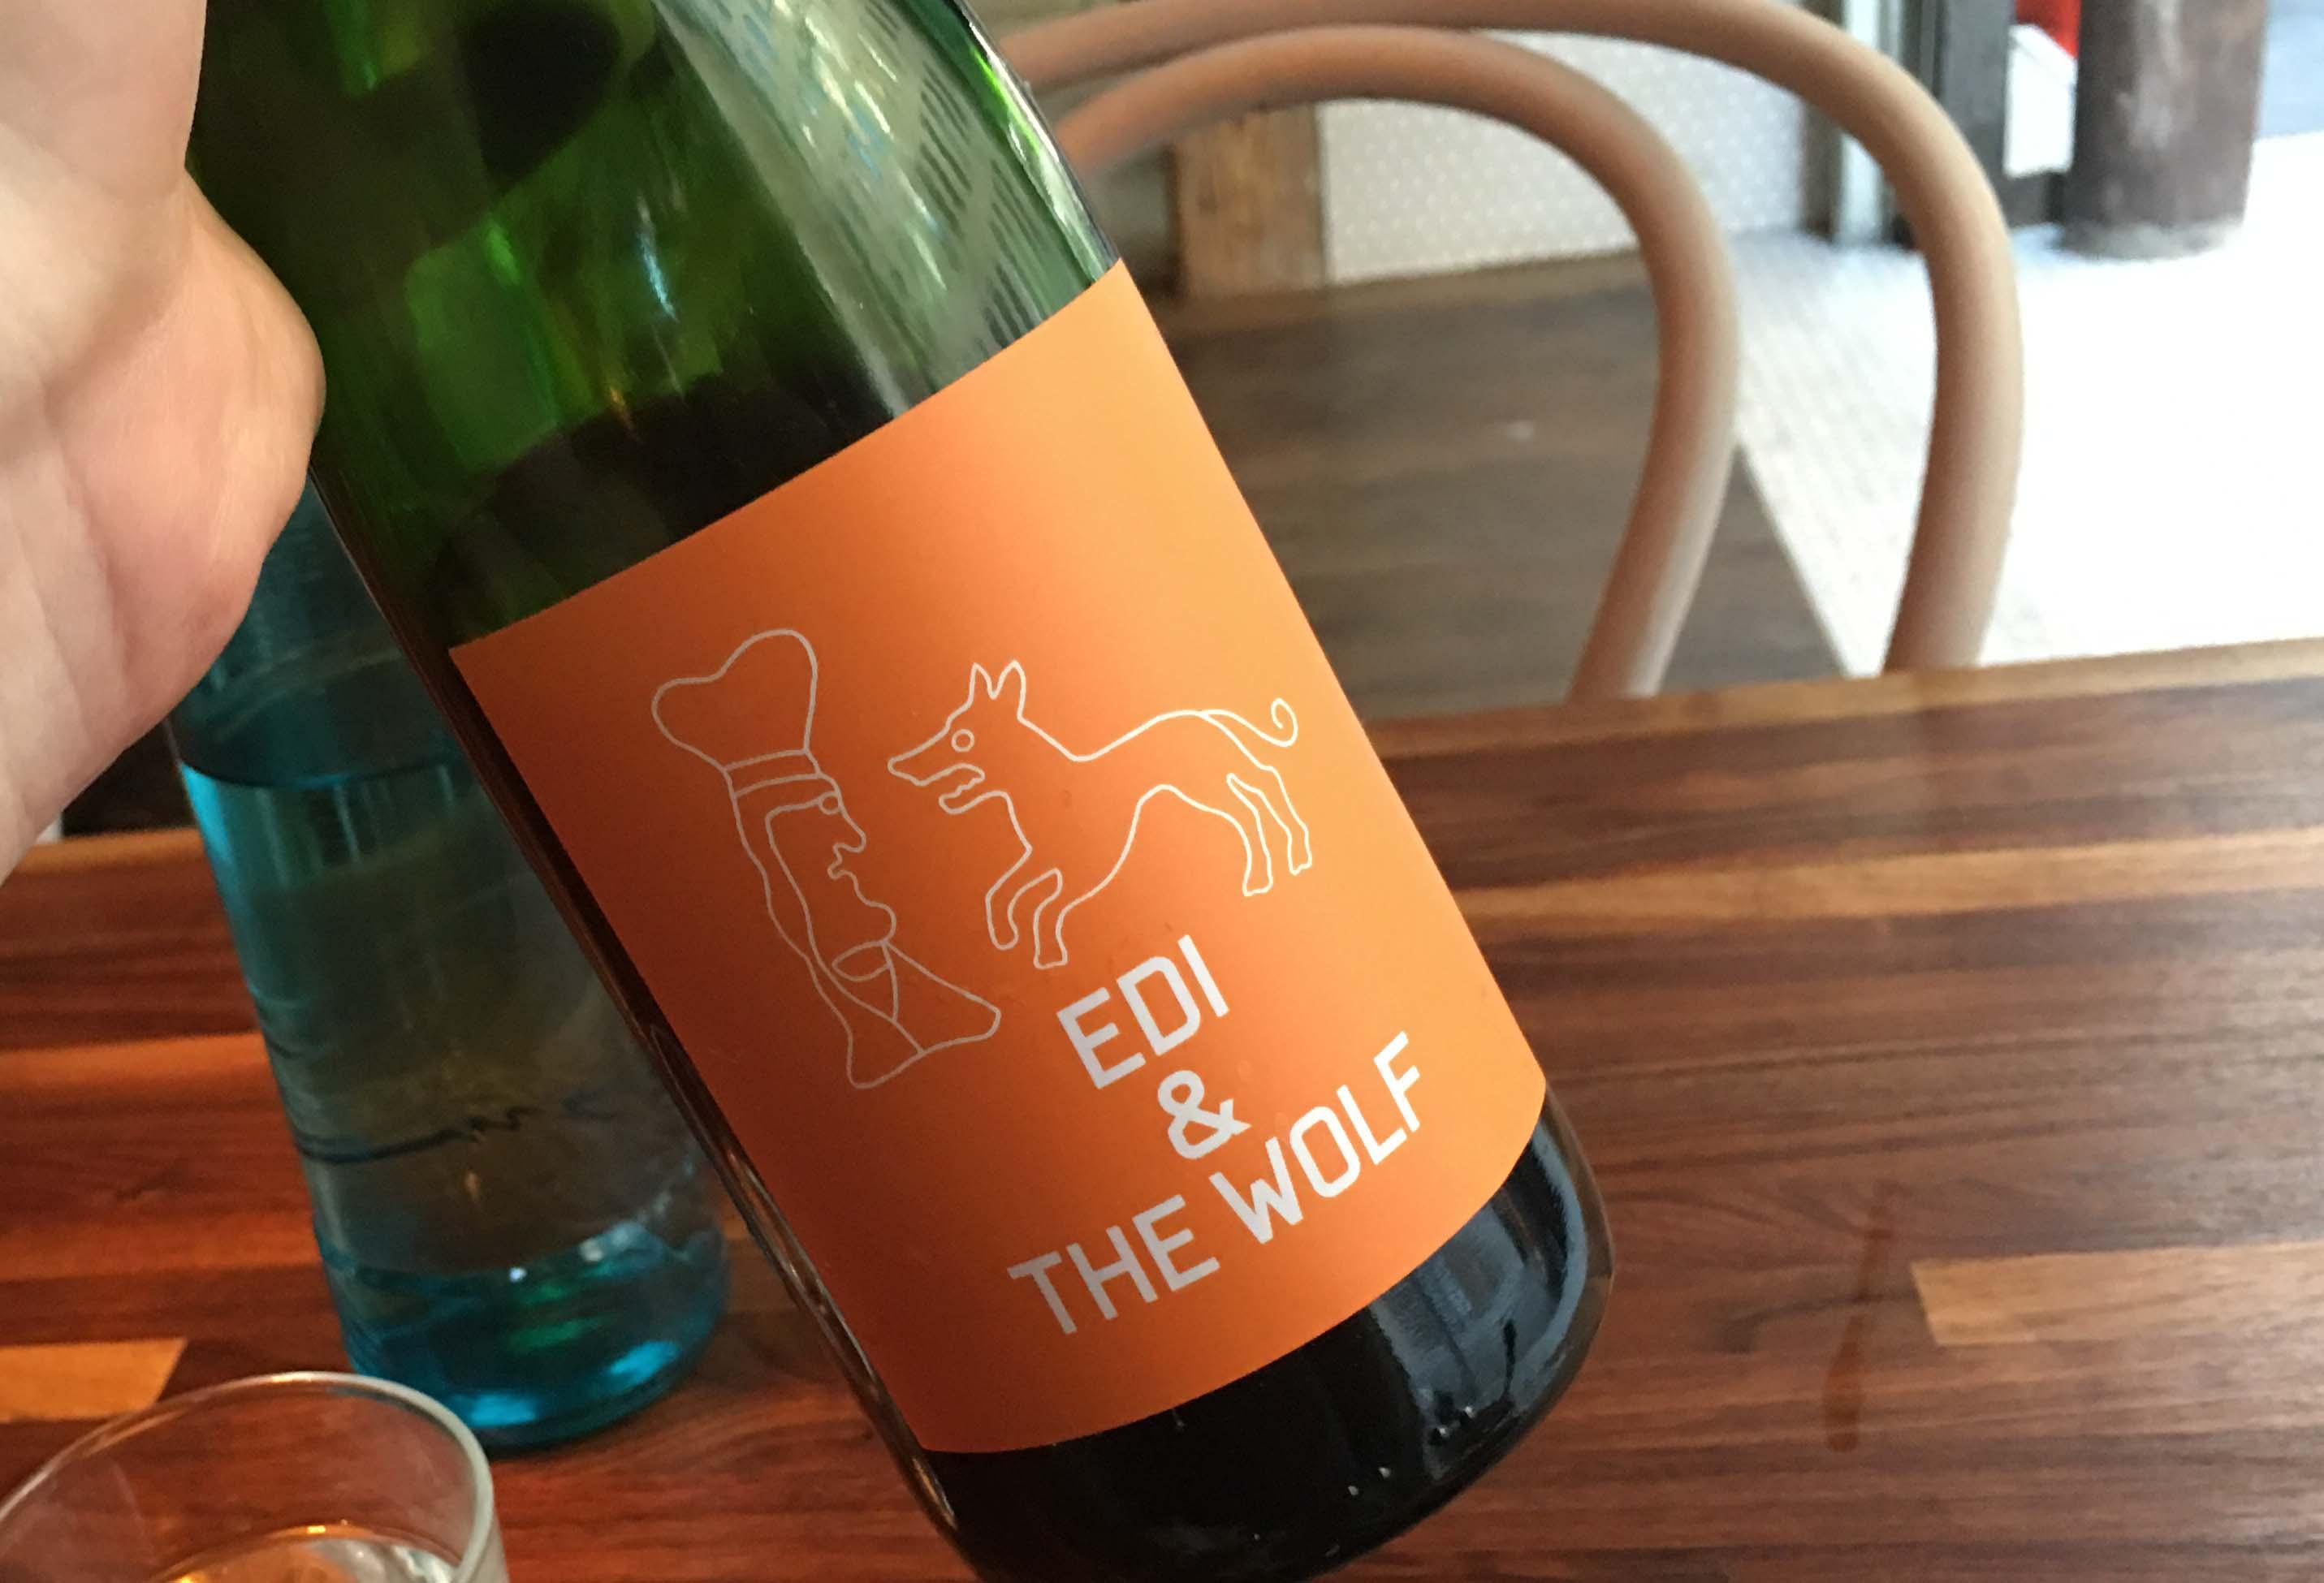 Schilling Edi and the Wolf wine